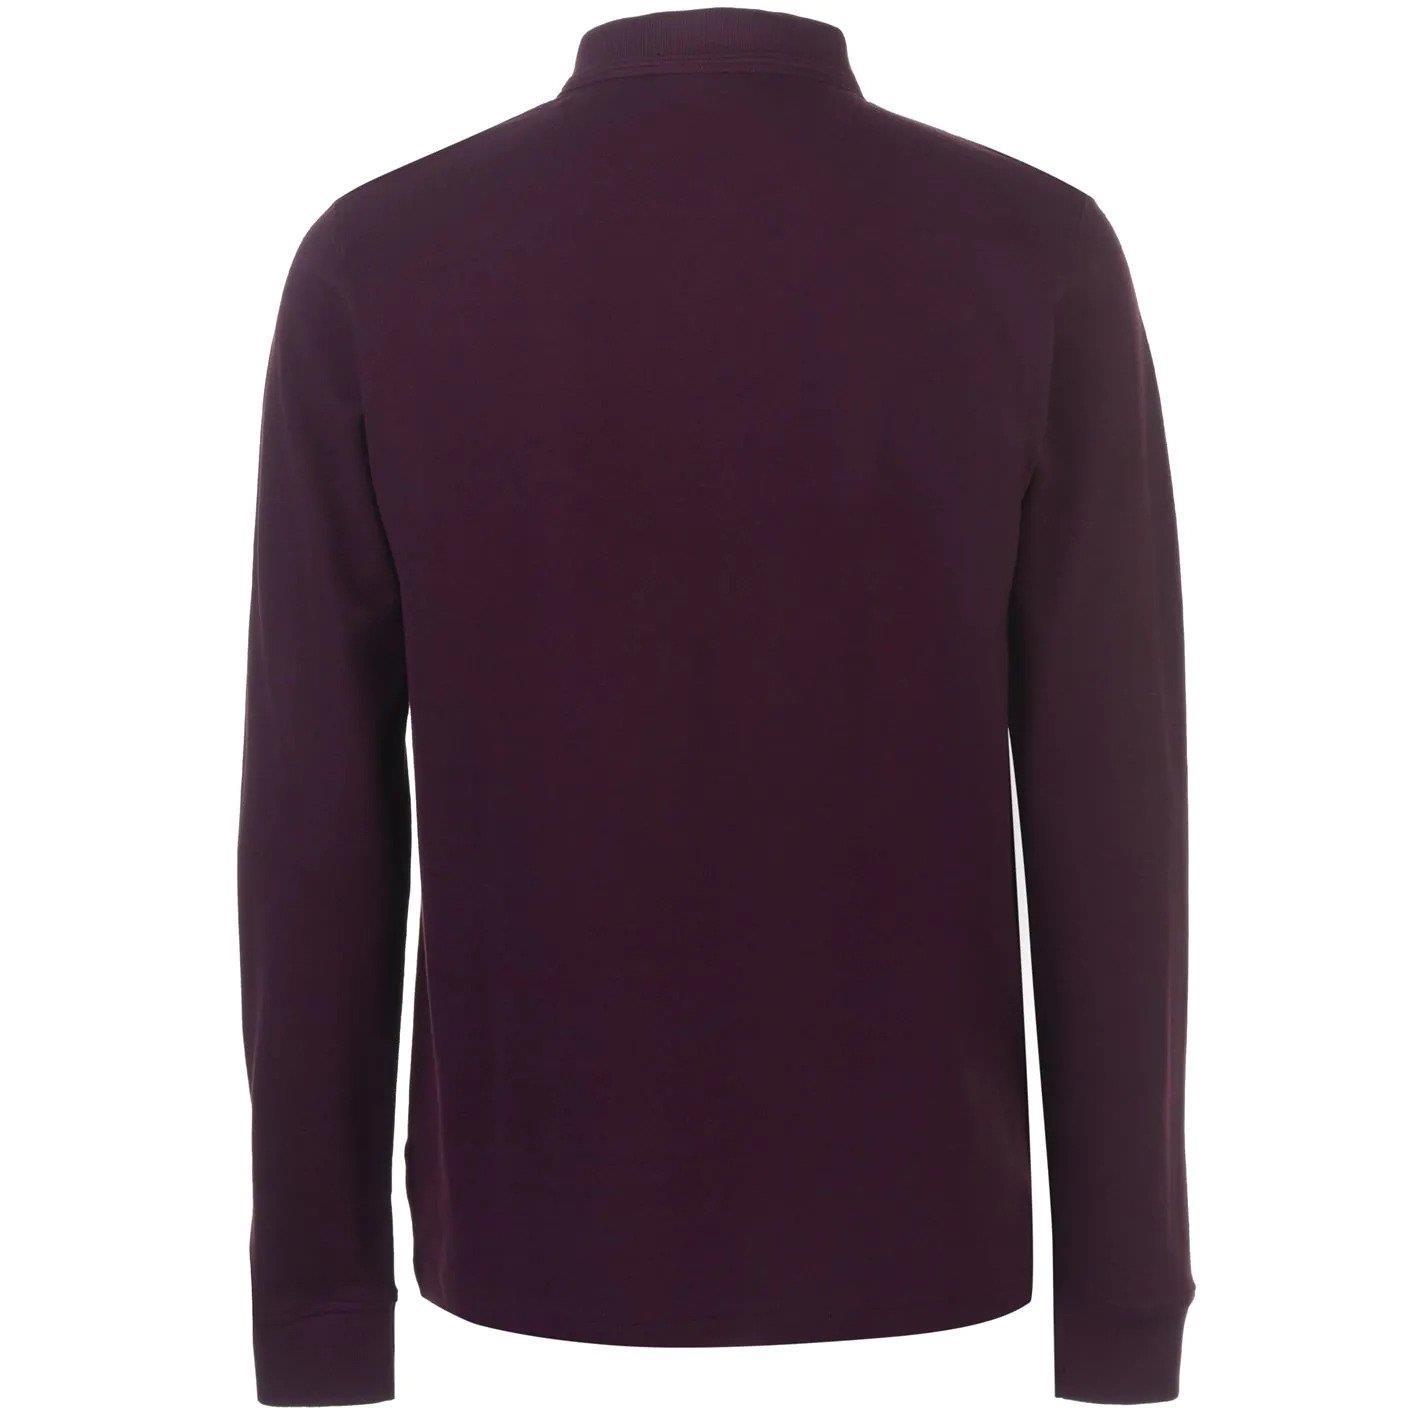 NEW-Pierre-Cardin-Mens-Long-Sleeve-Pure-Cotton-Polo-Shirt-Size-S-M-L-XL-XXL thumbnail 26